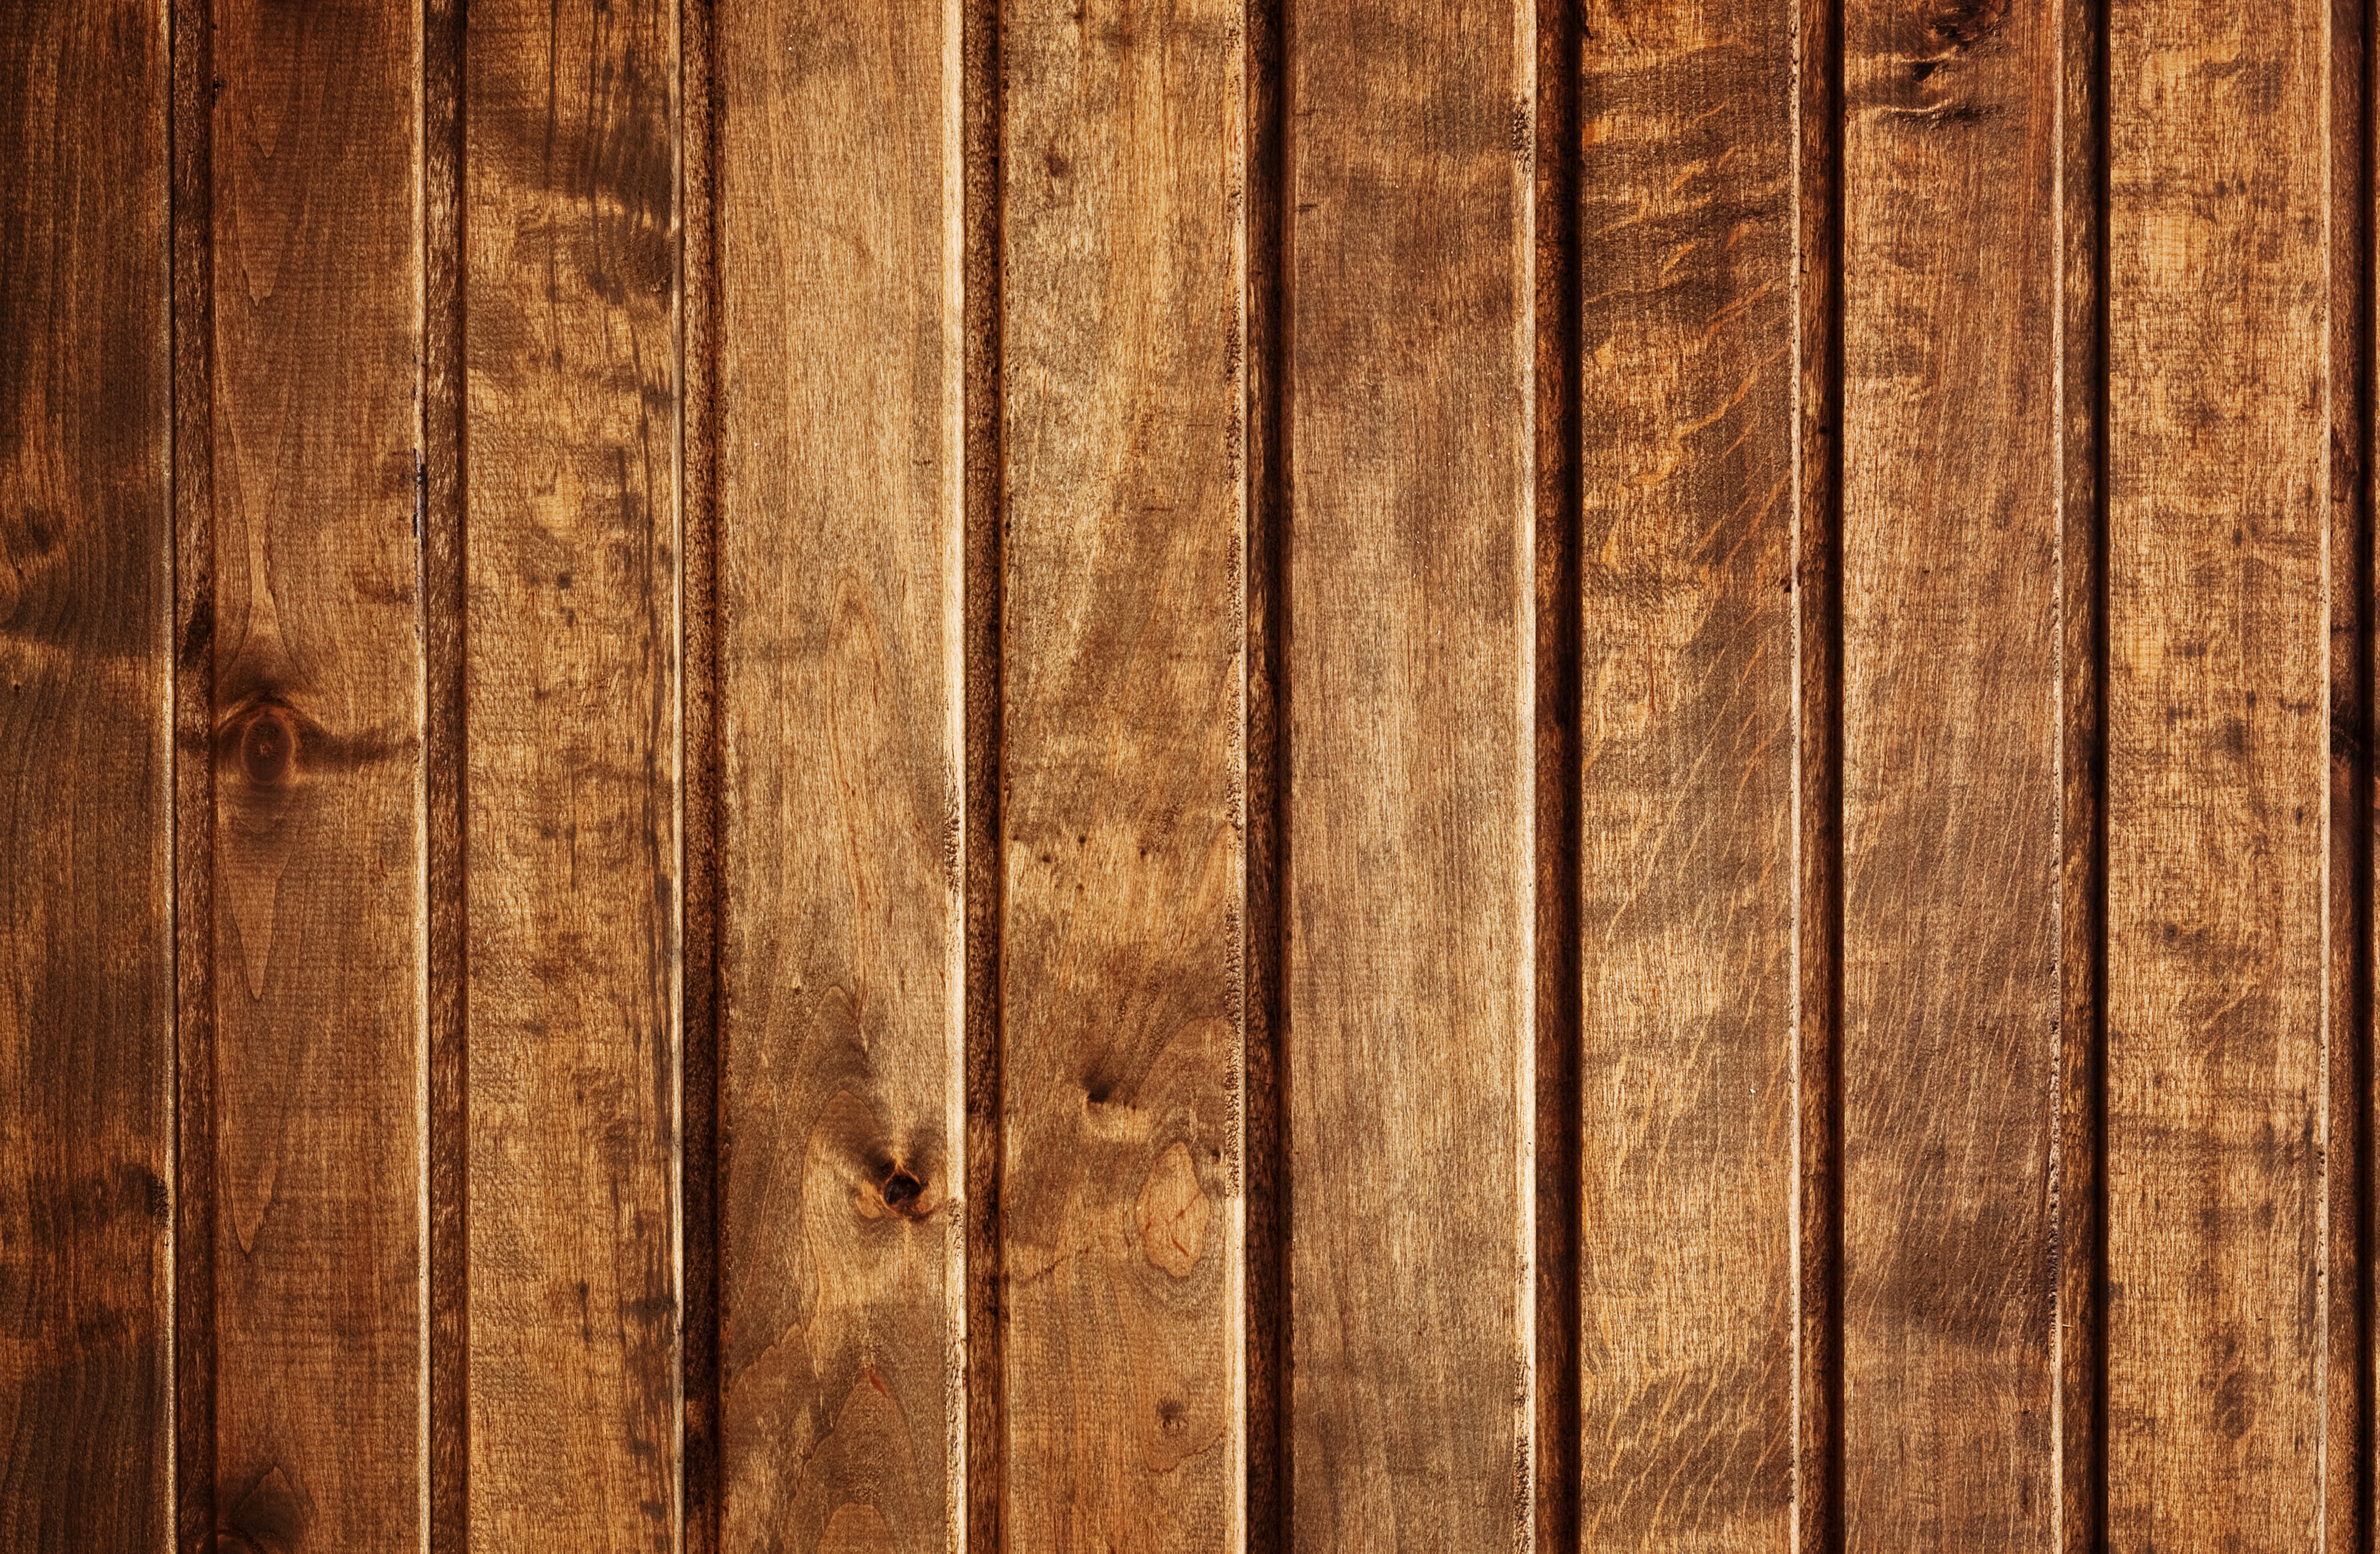 Texture background wood board wallpaper   ForWallpapercom 3333x2176